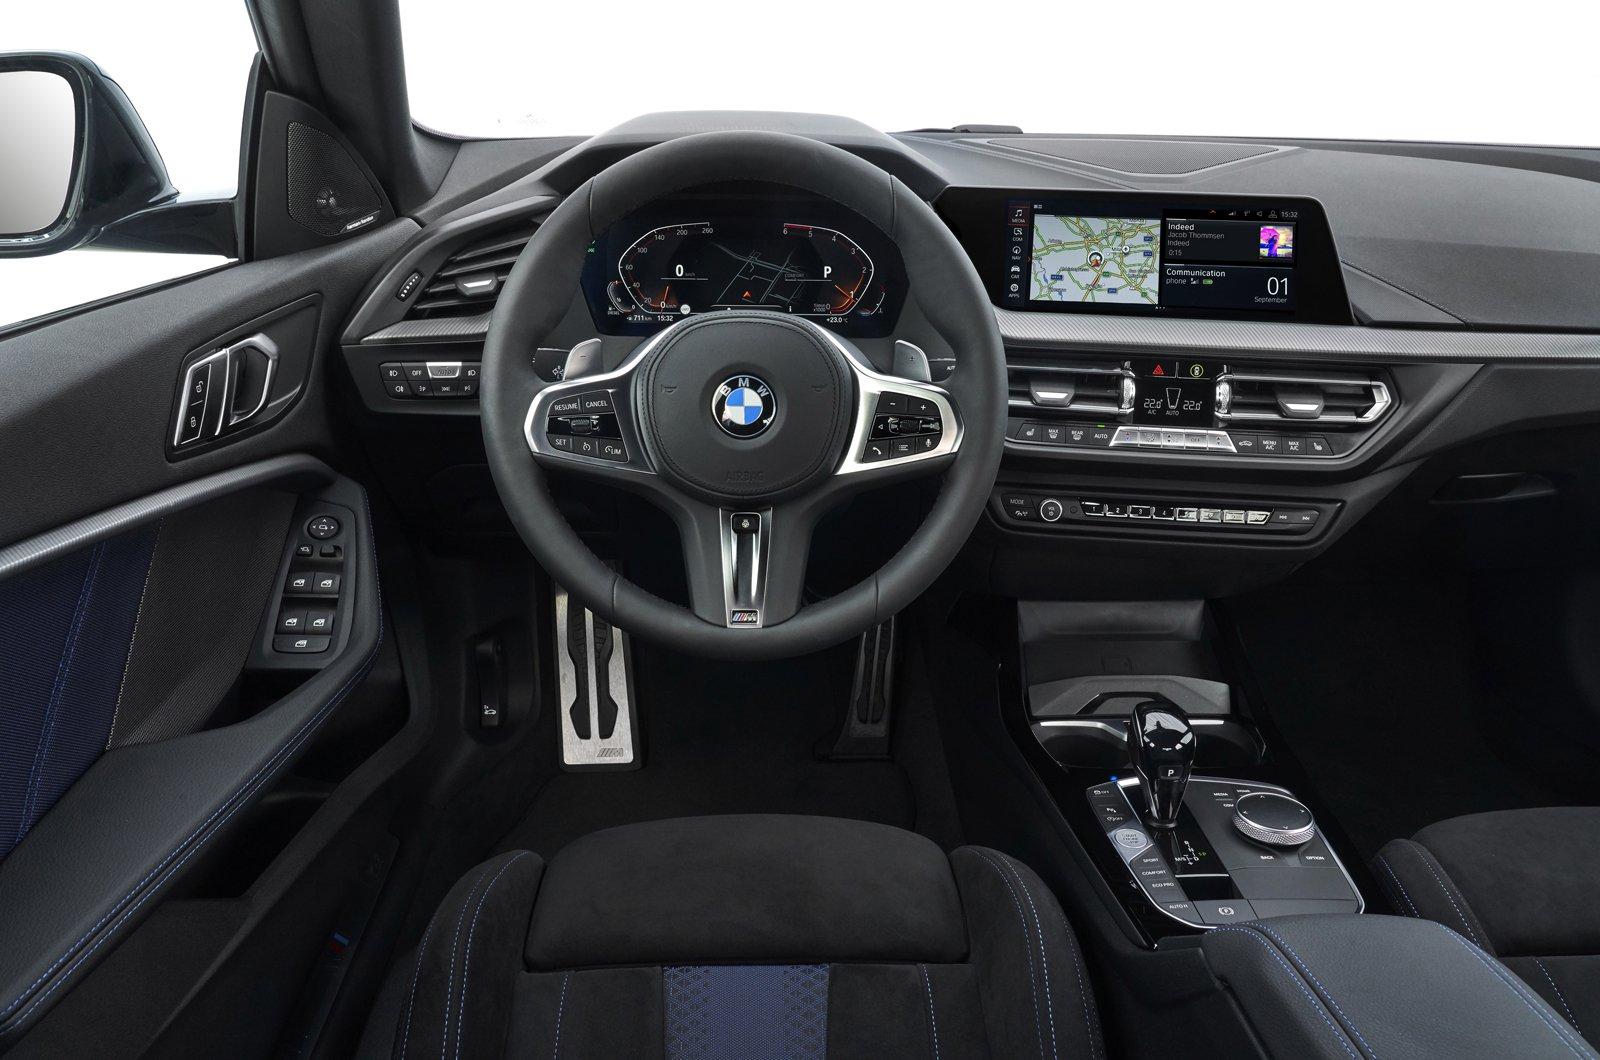 2020 BMW 2 Series Gran Coupe dashboard